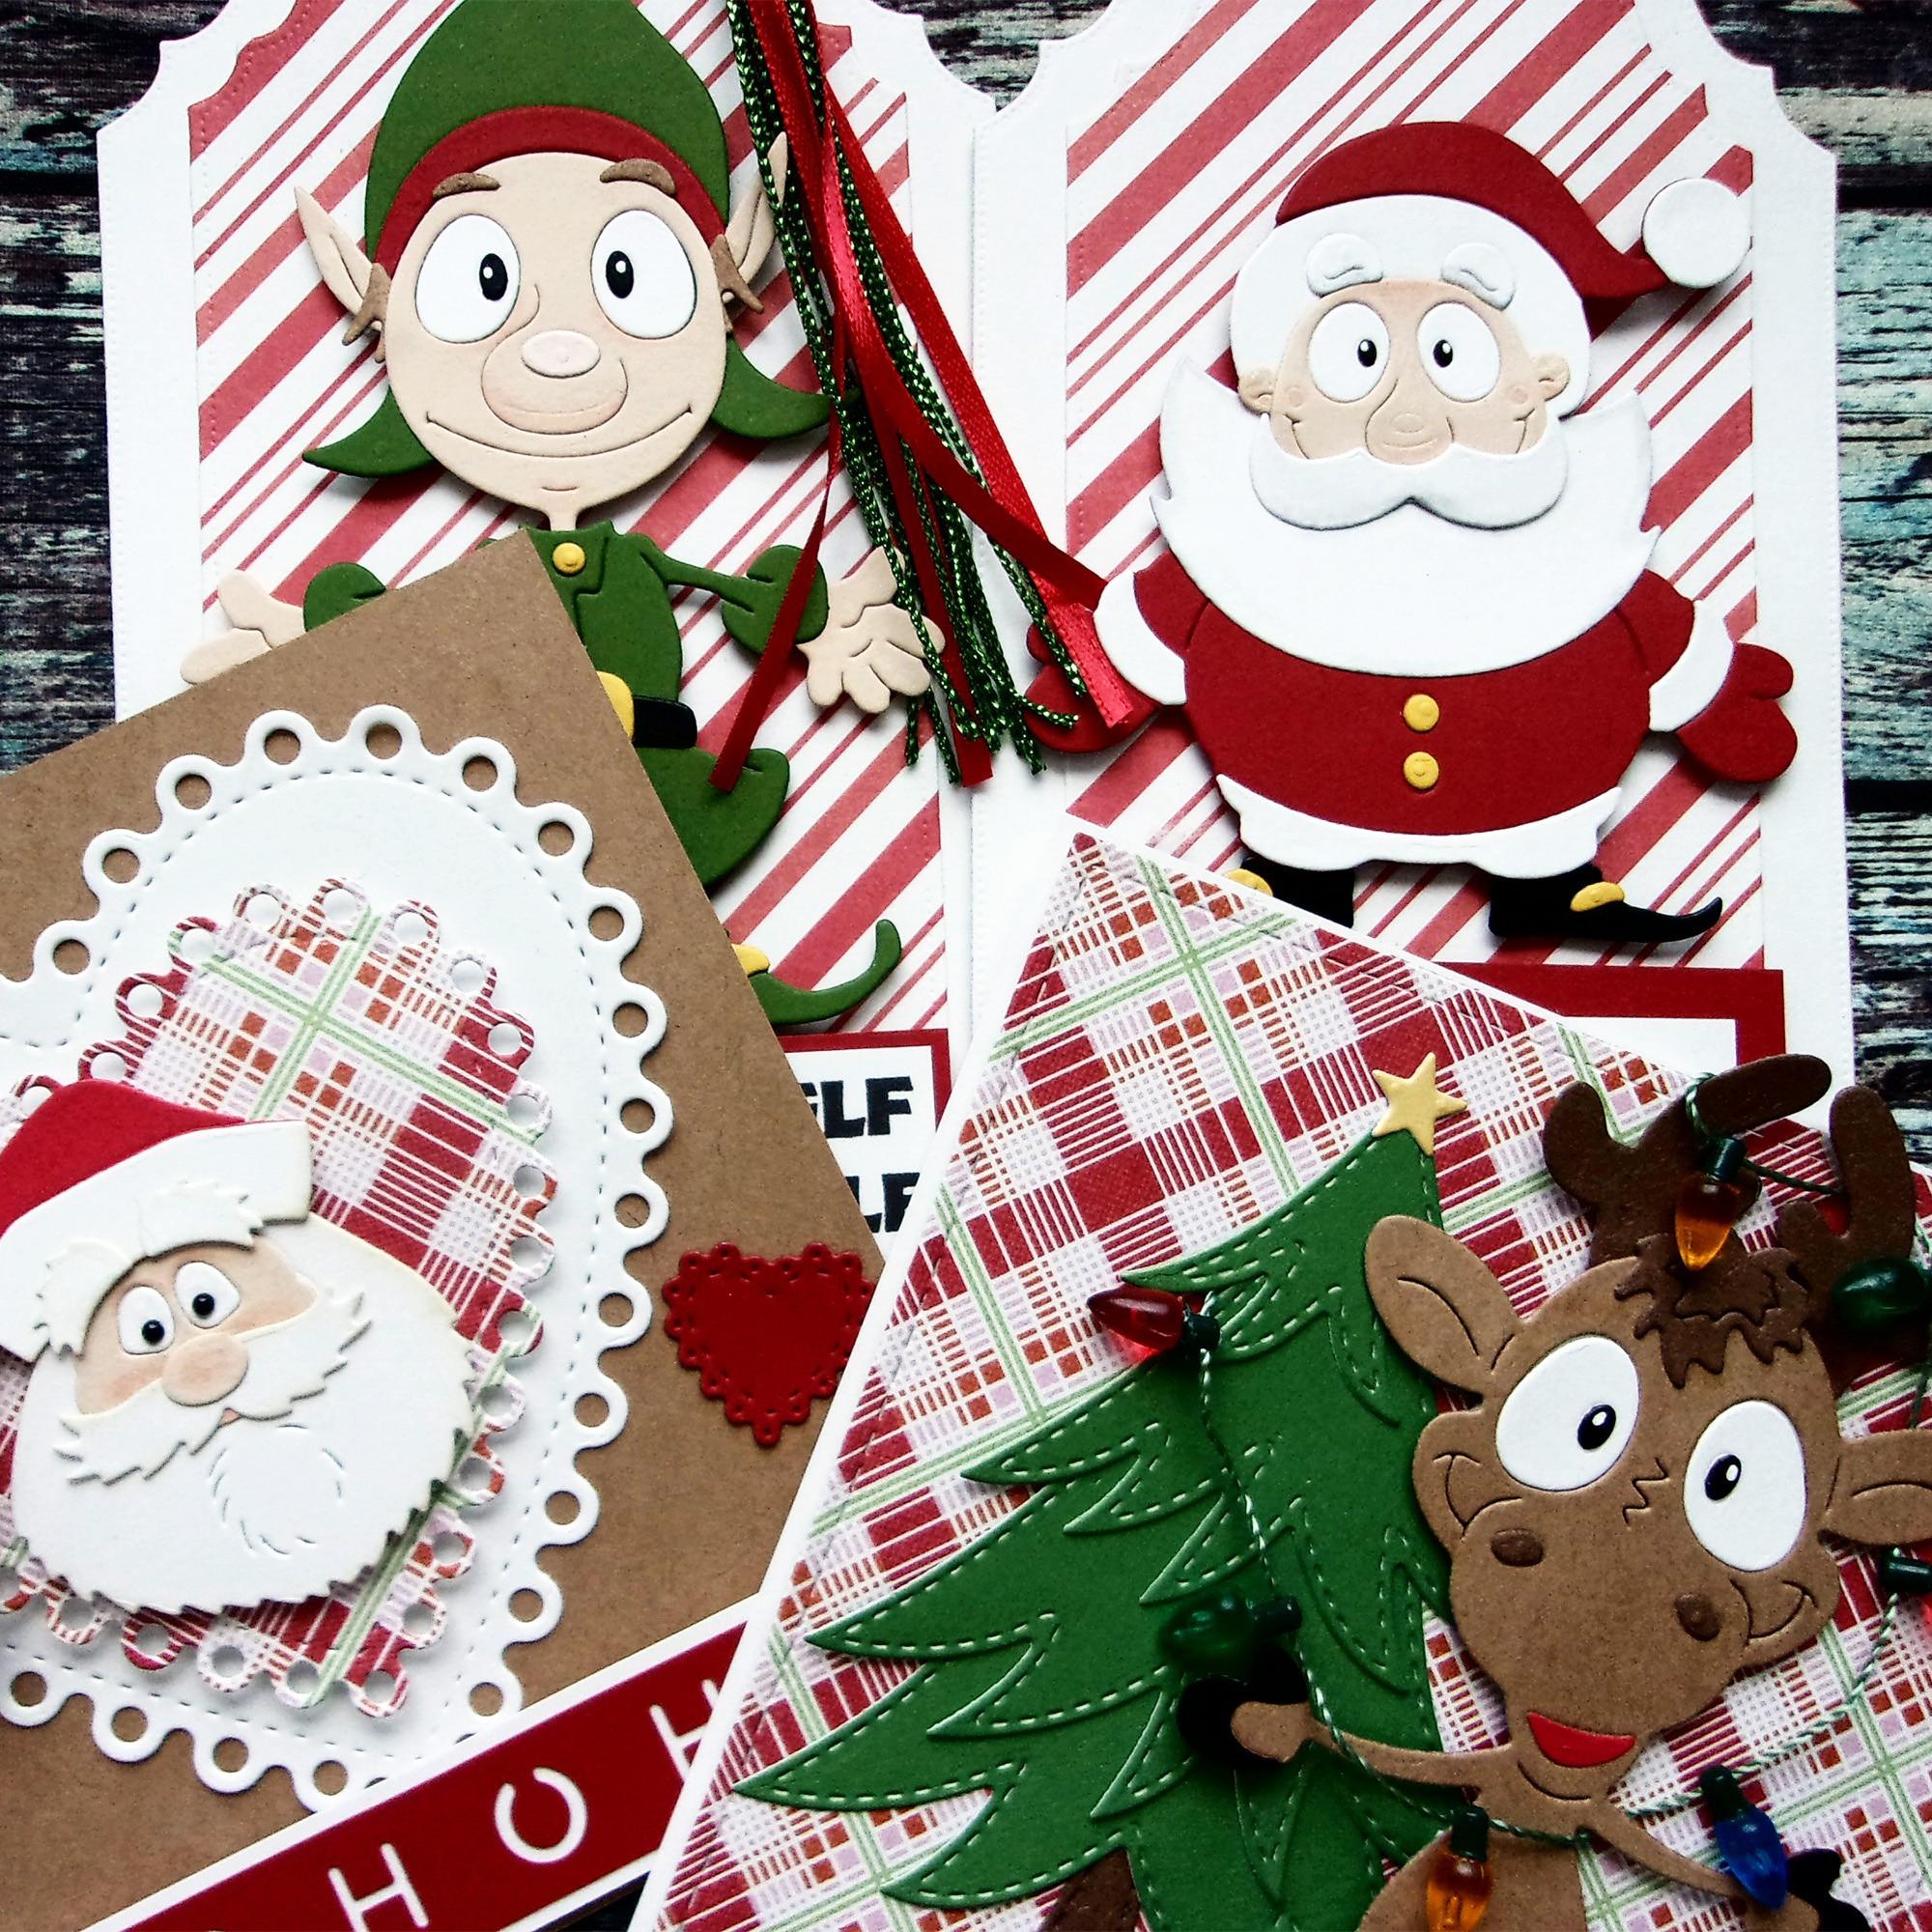 Xmas Snowflake Metal Cutting Dies Christmas Scrapbooking Paper Cards Decor*TS